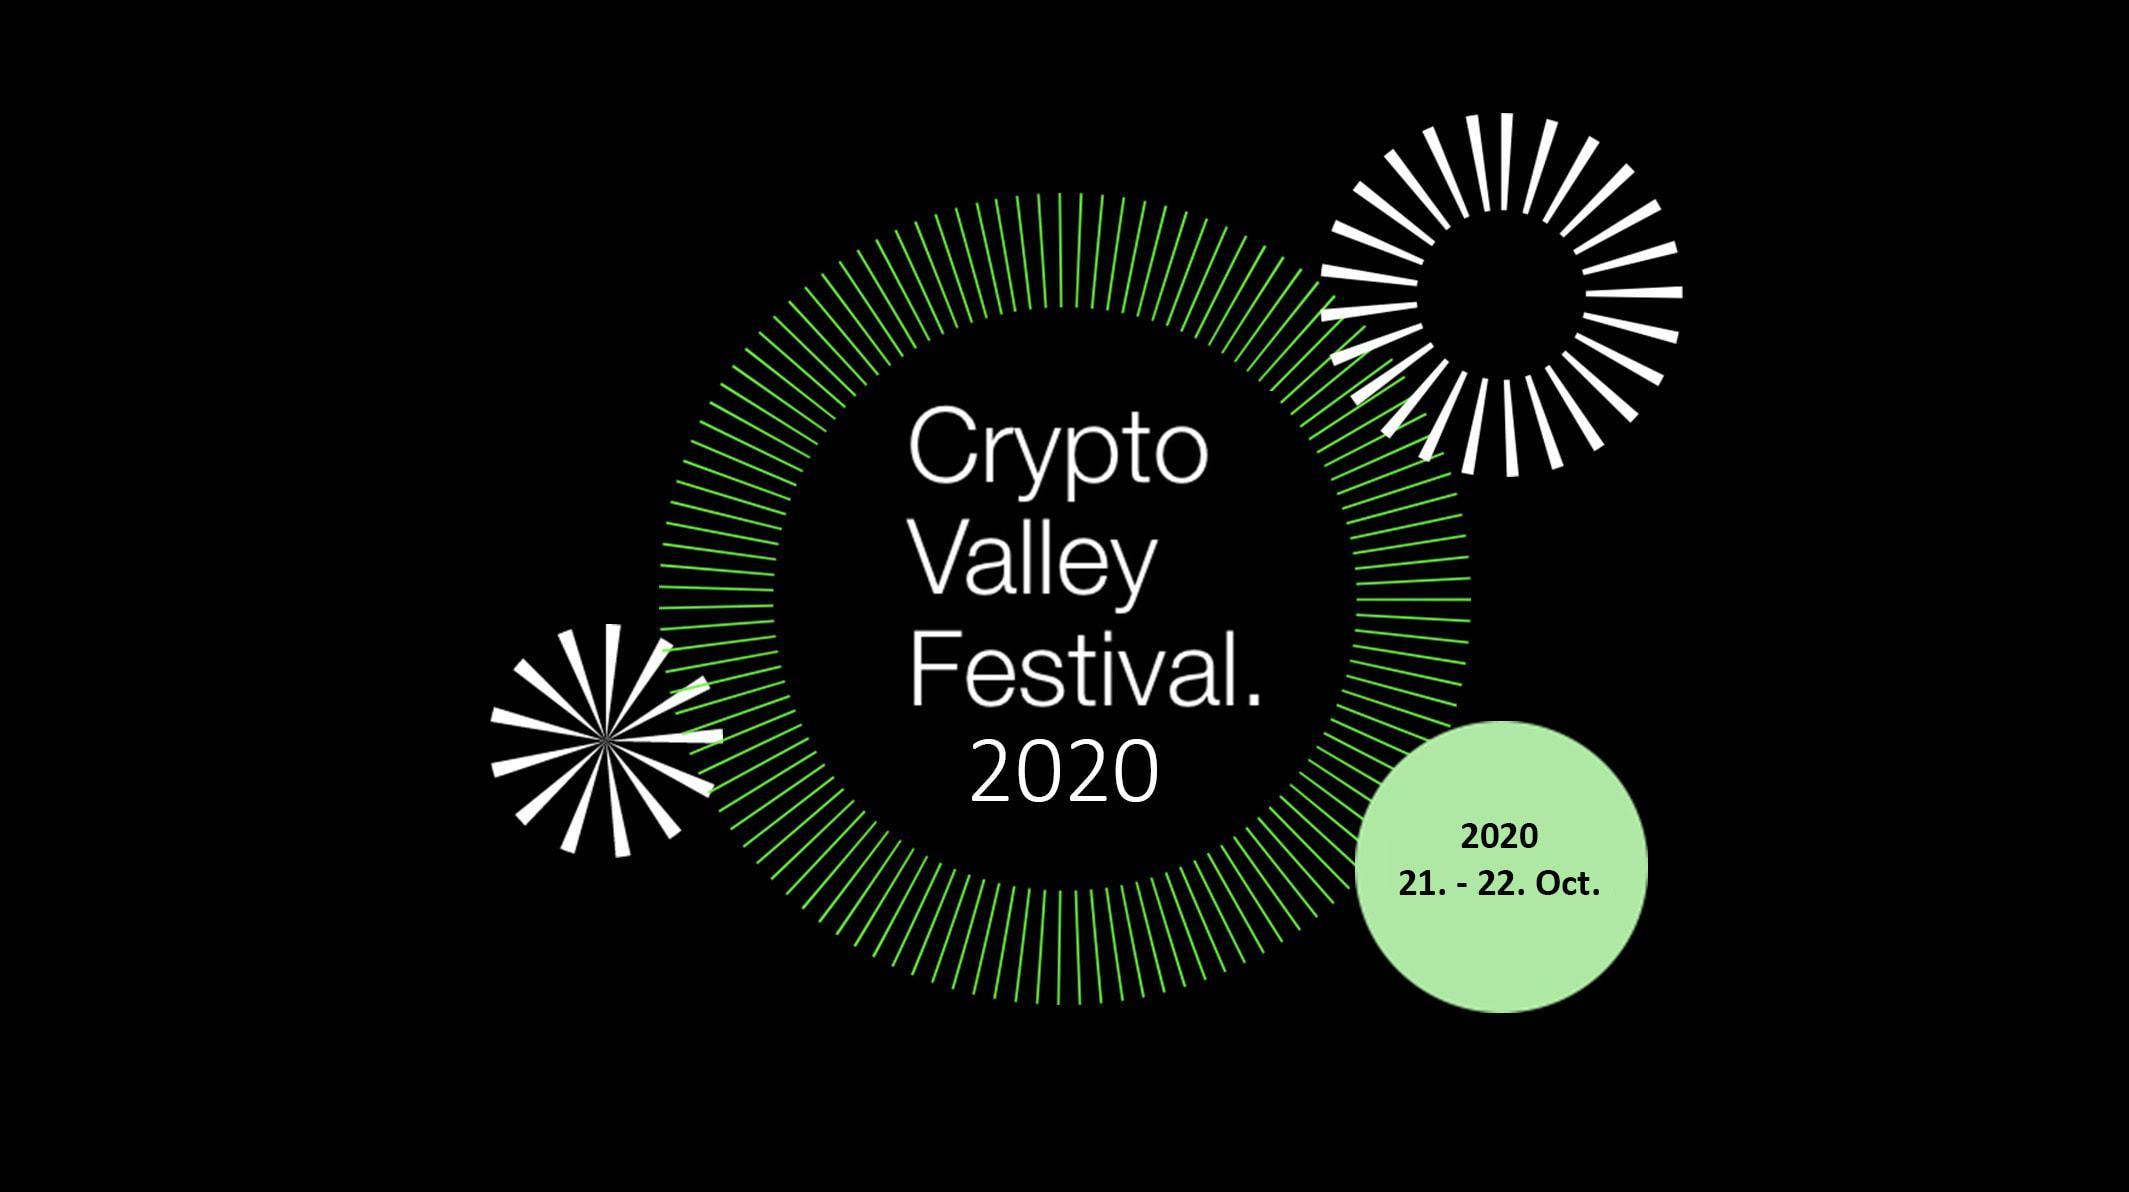 Crypto Valley Festival